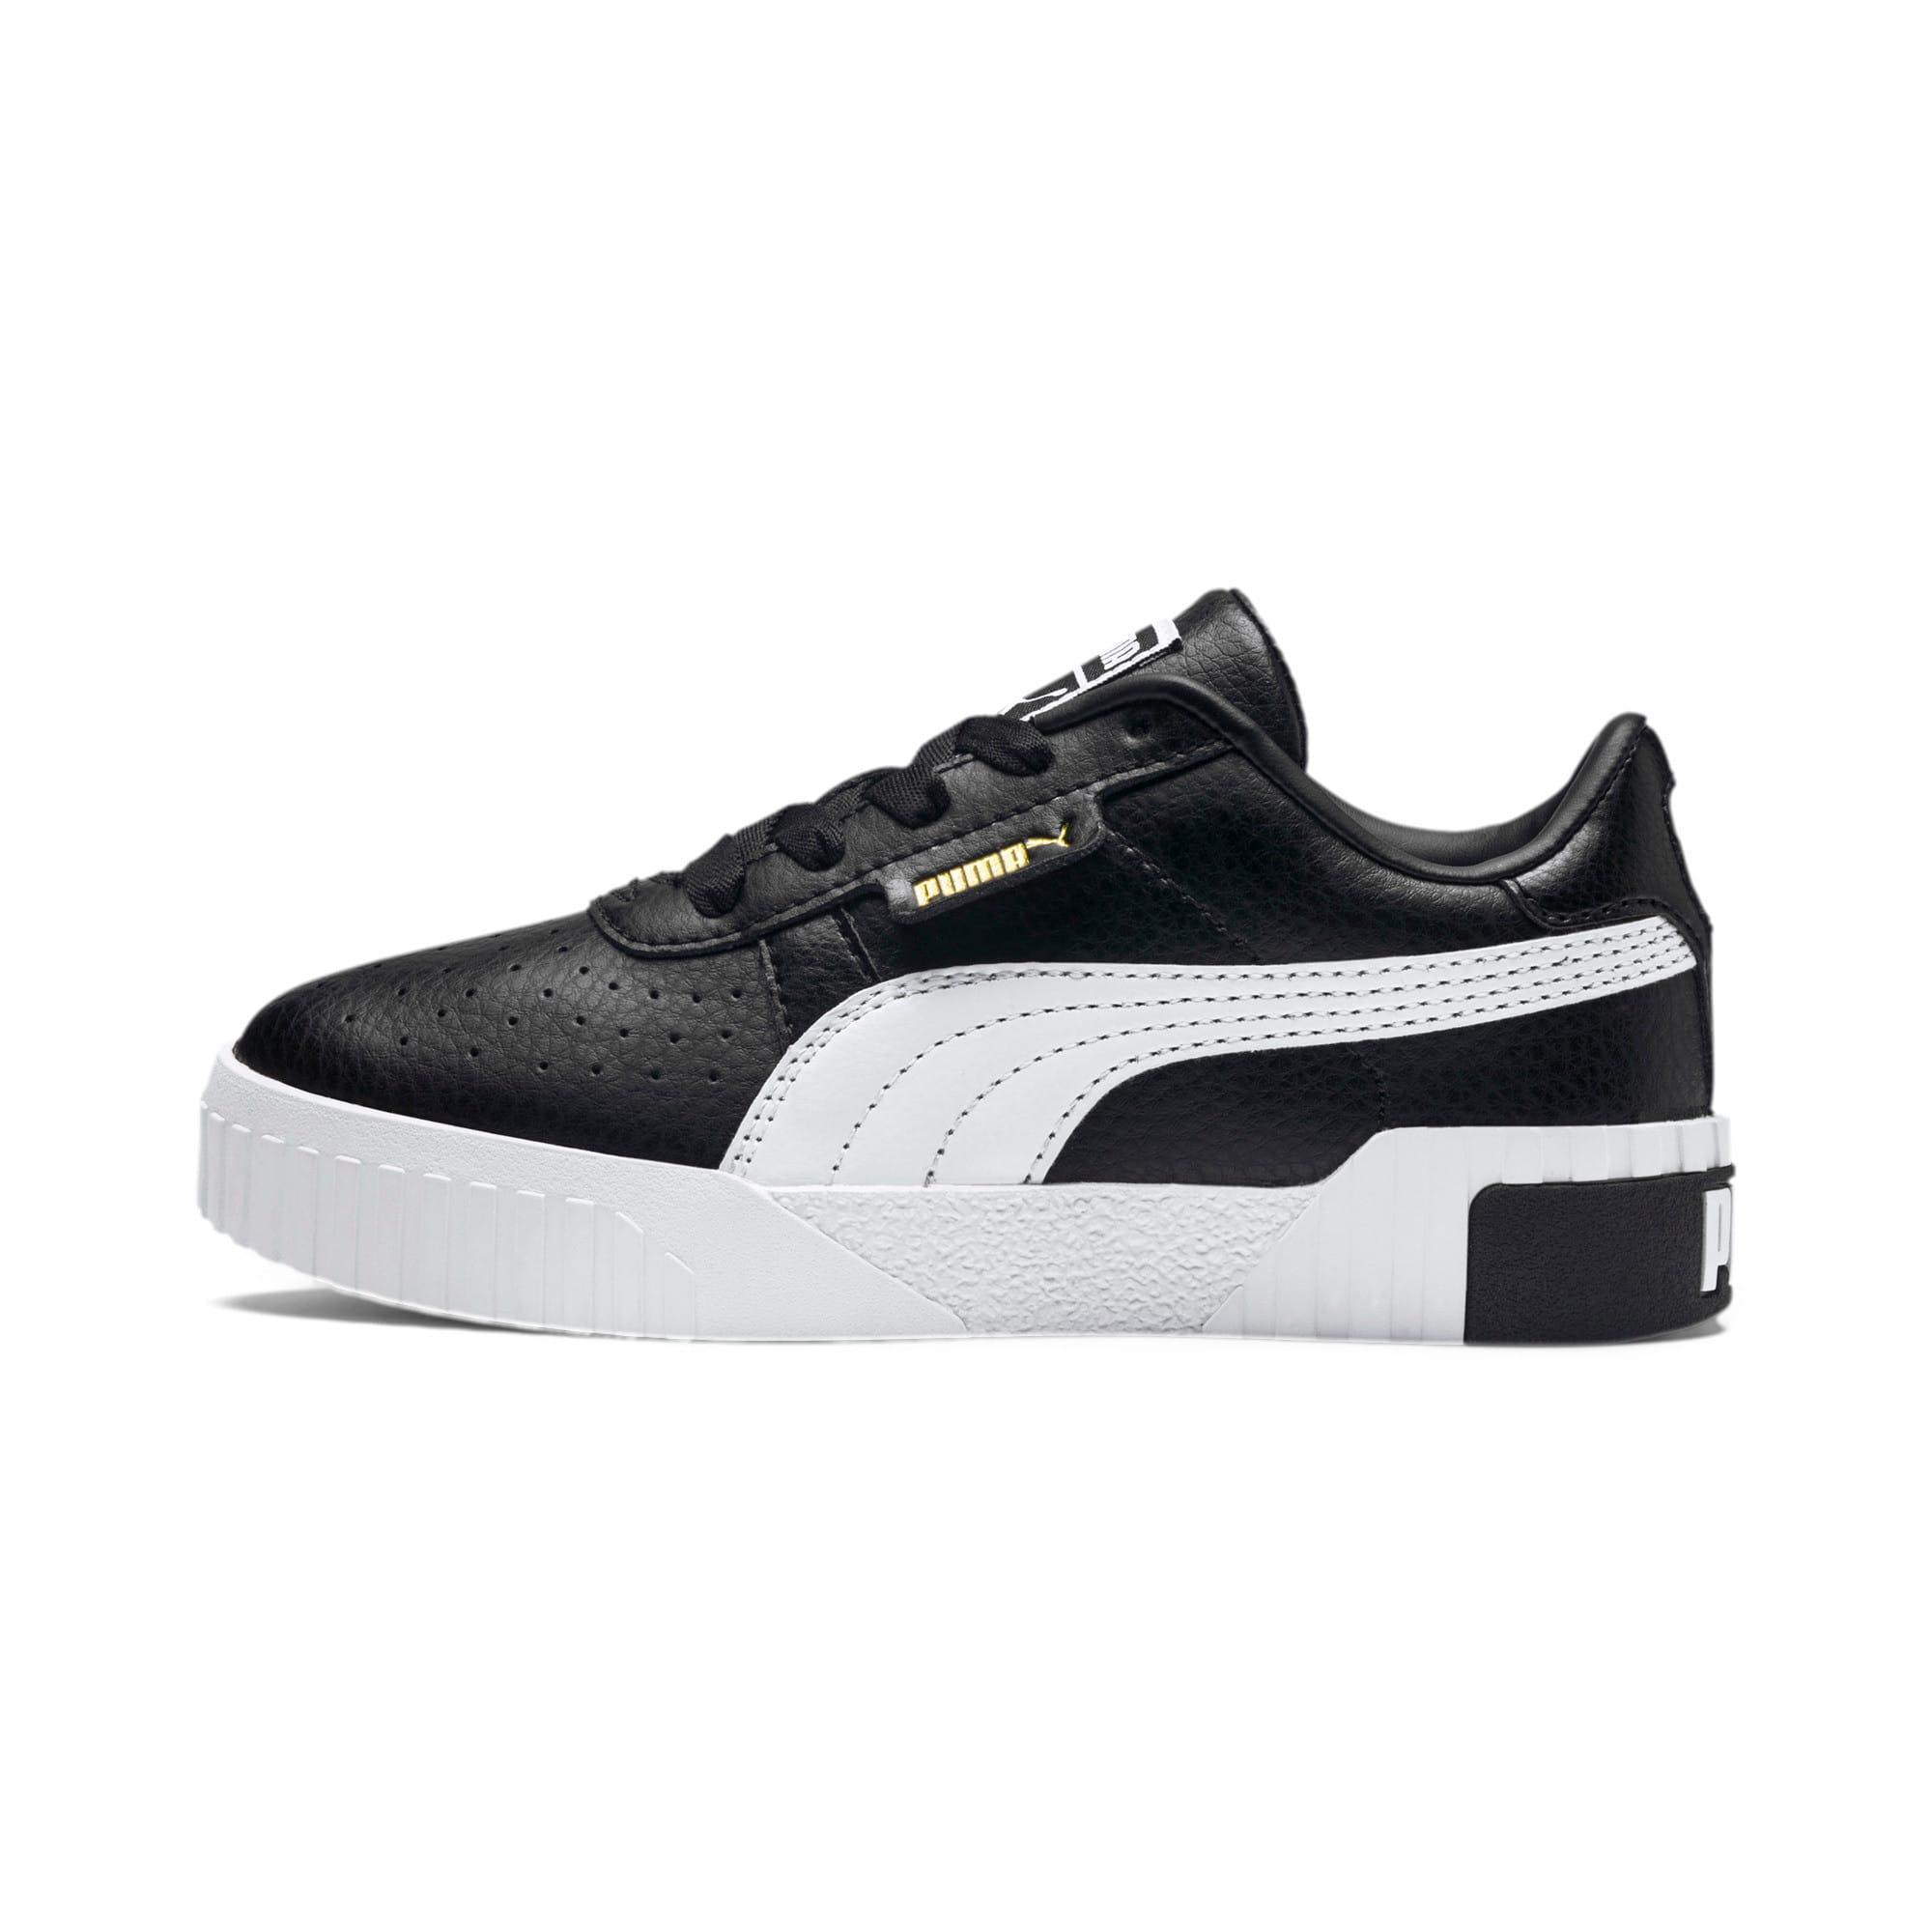 Thumbnail 1 of Cali Kids' Mädchen Sneaker, Puma Black-Puma Team Gold, medium